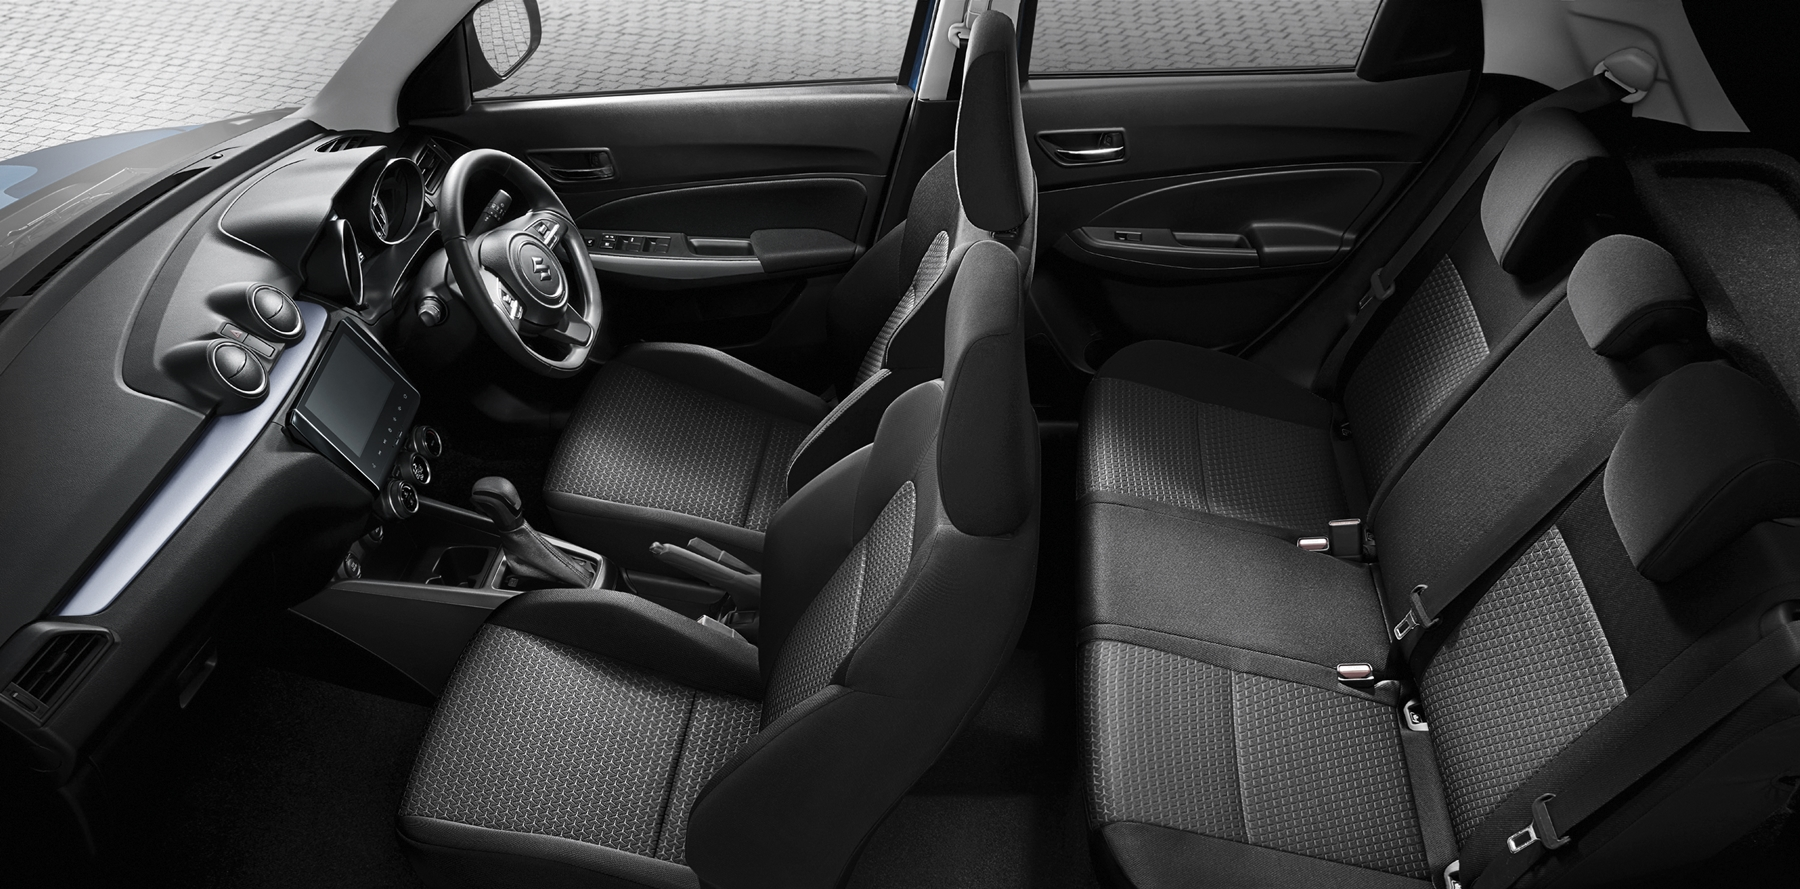 Suzuki Swift 2021 Autoinfo (1)